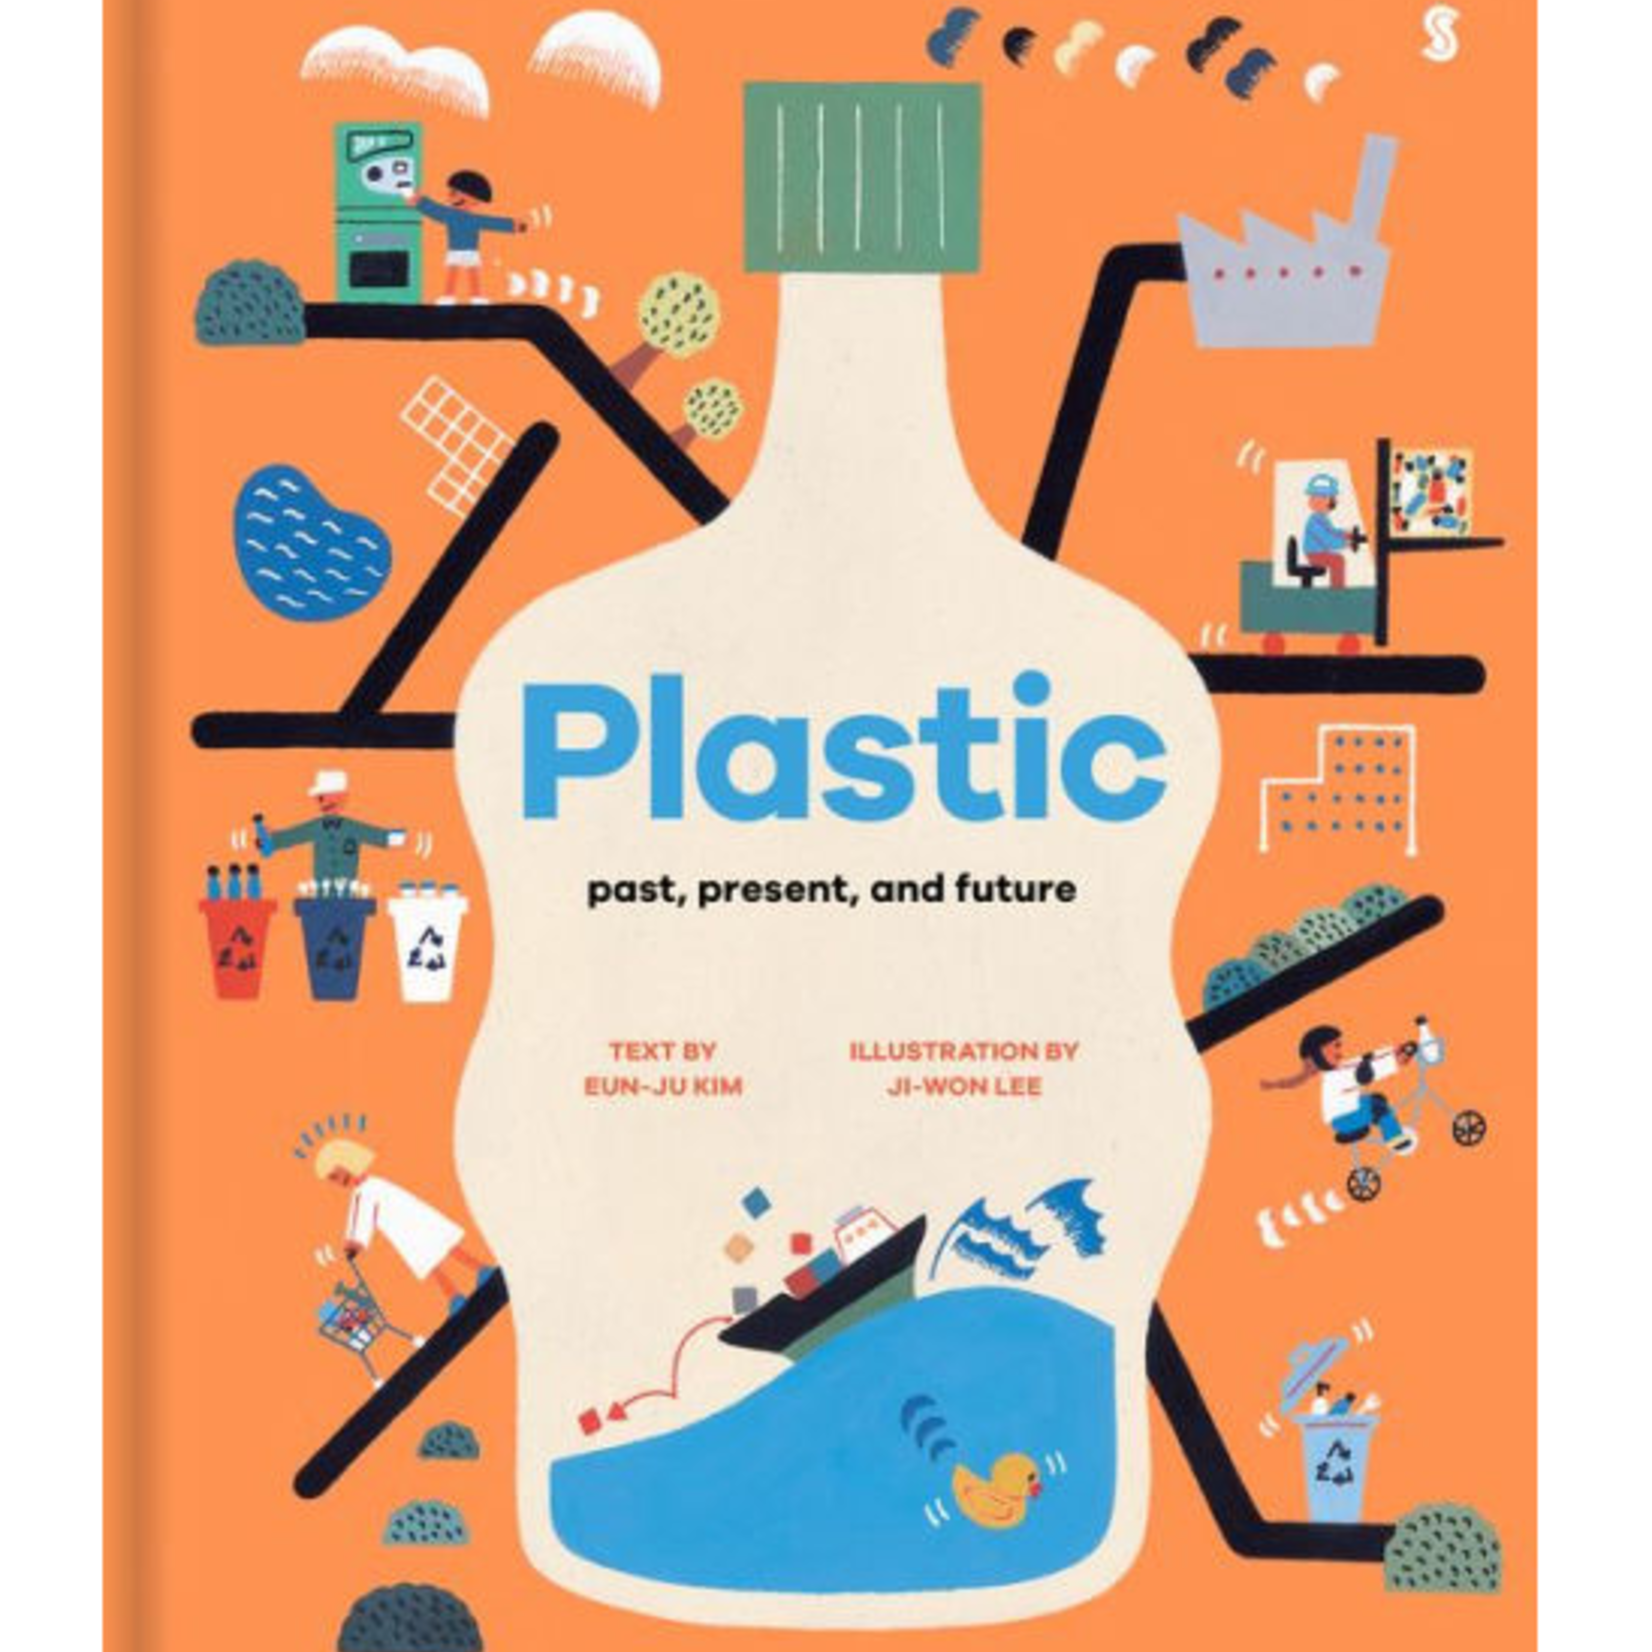 Plastic - Past, Present and Future